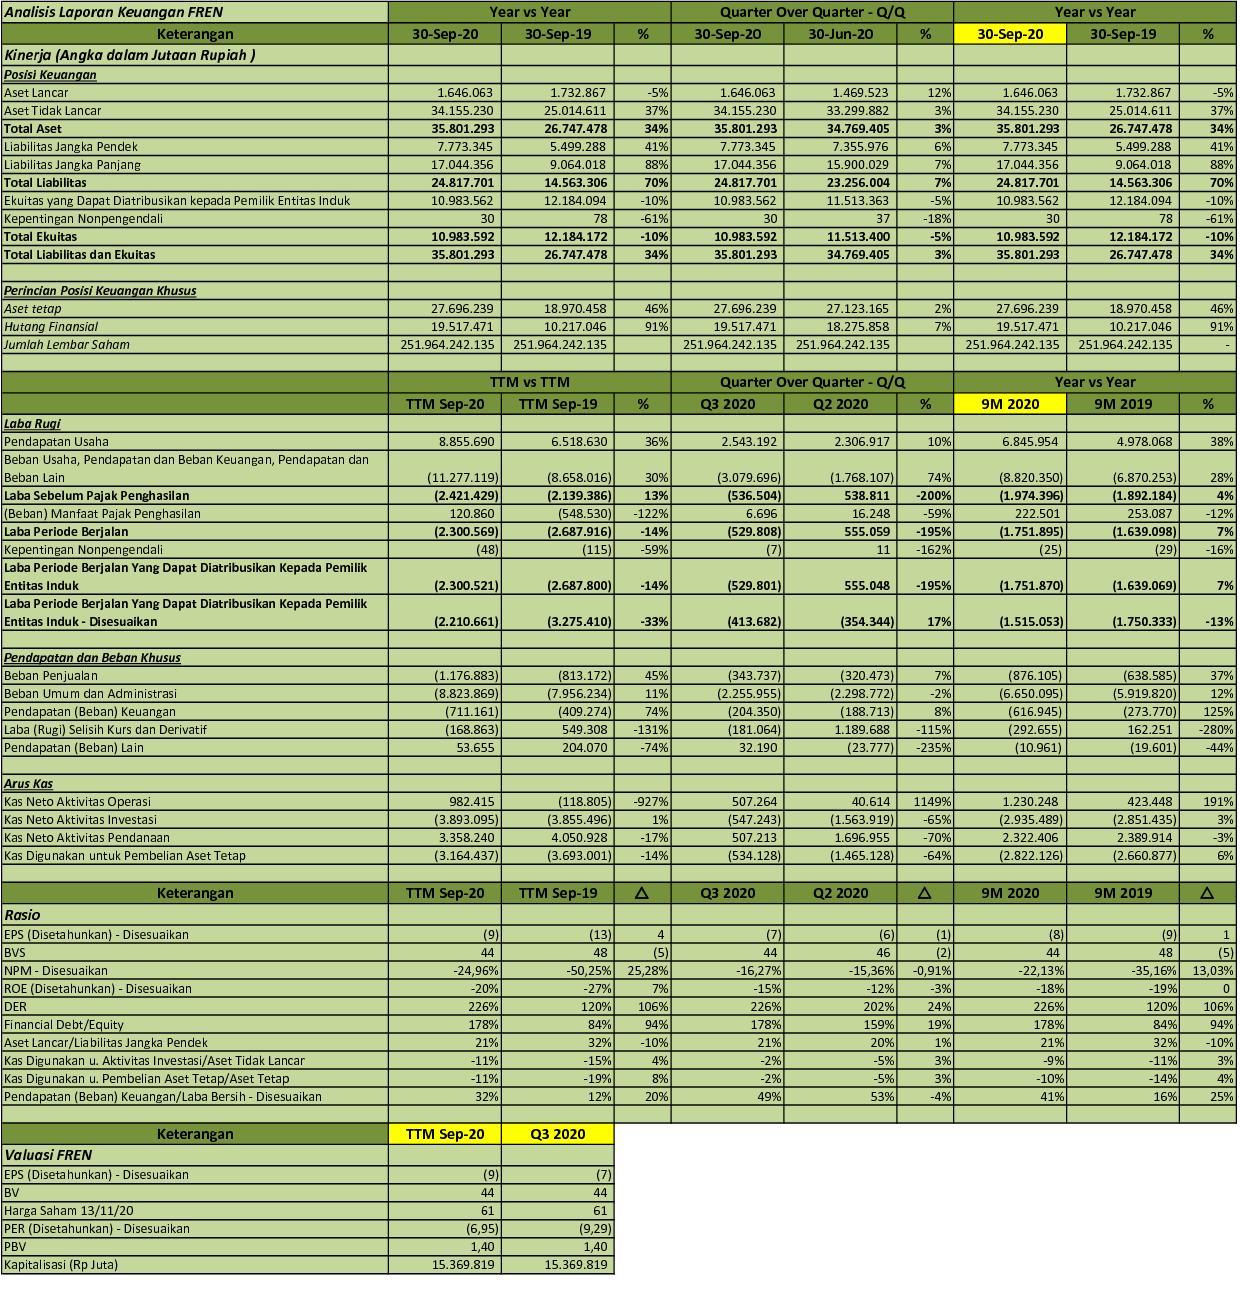 Idx Investor Fren Q3 2020 Pt Smartfren Telecom Tbk Analisis Laporan Keuangan